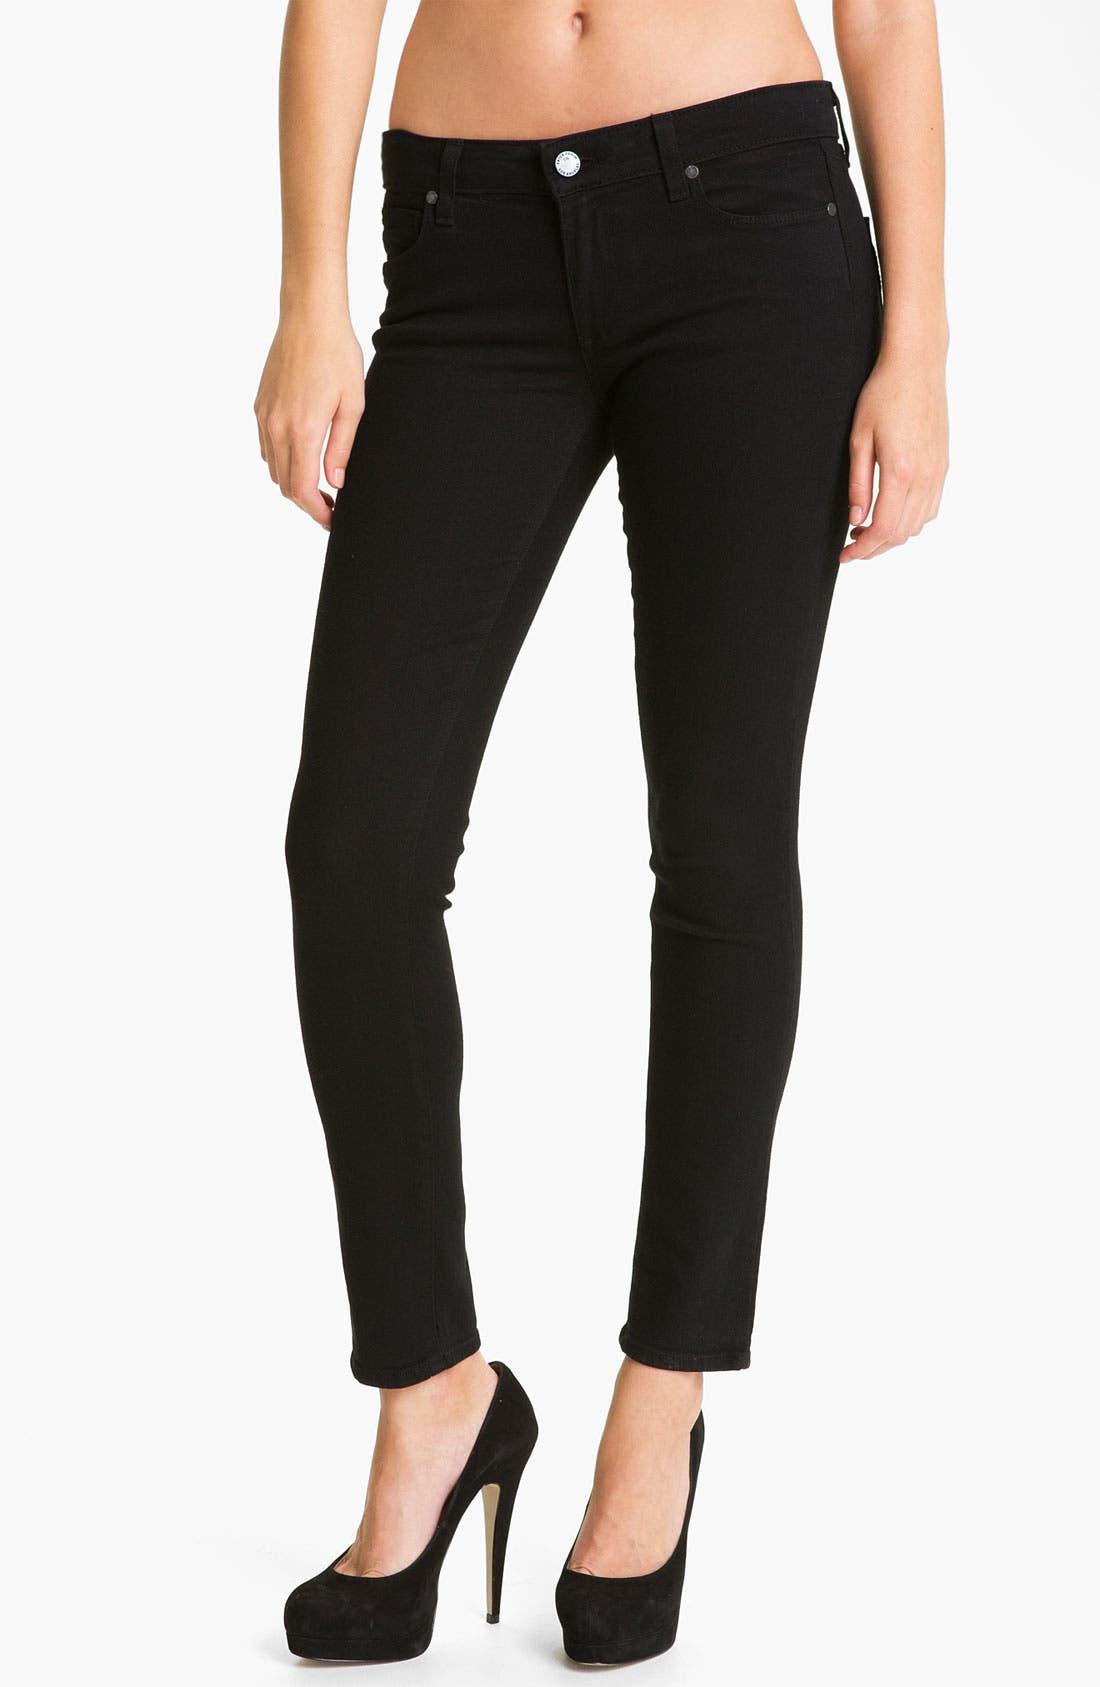 Alternate Image 1 Selected - Paige Denim 'Skyline' Ankle Peg Skinny Stretch Jeans (Black Ink)